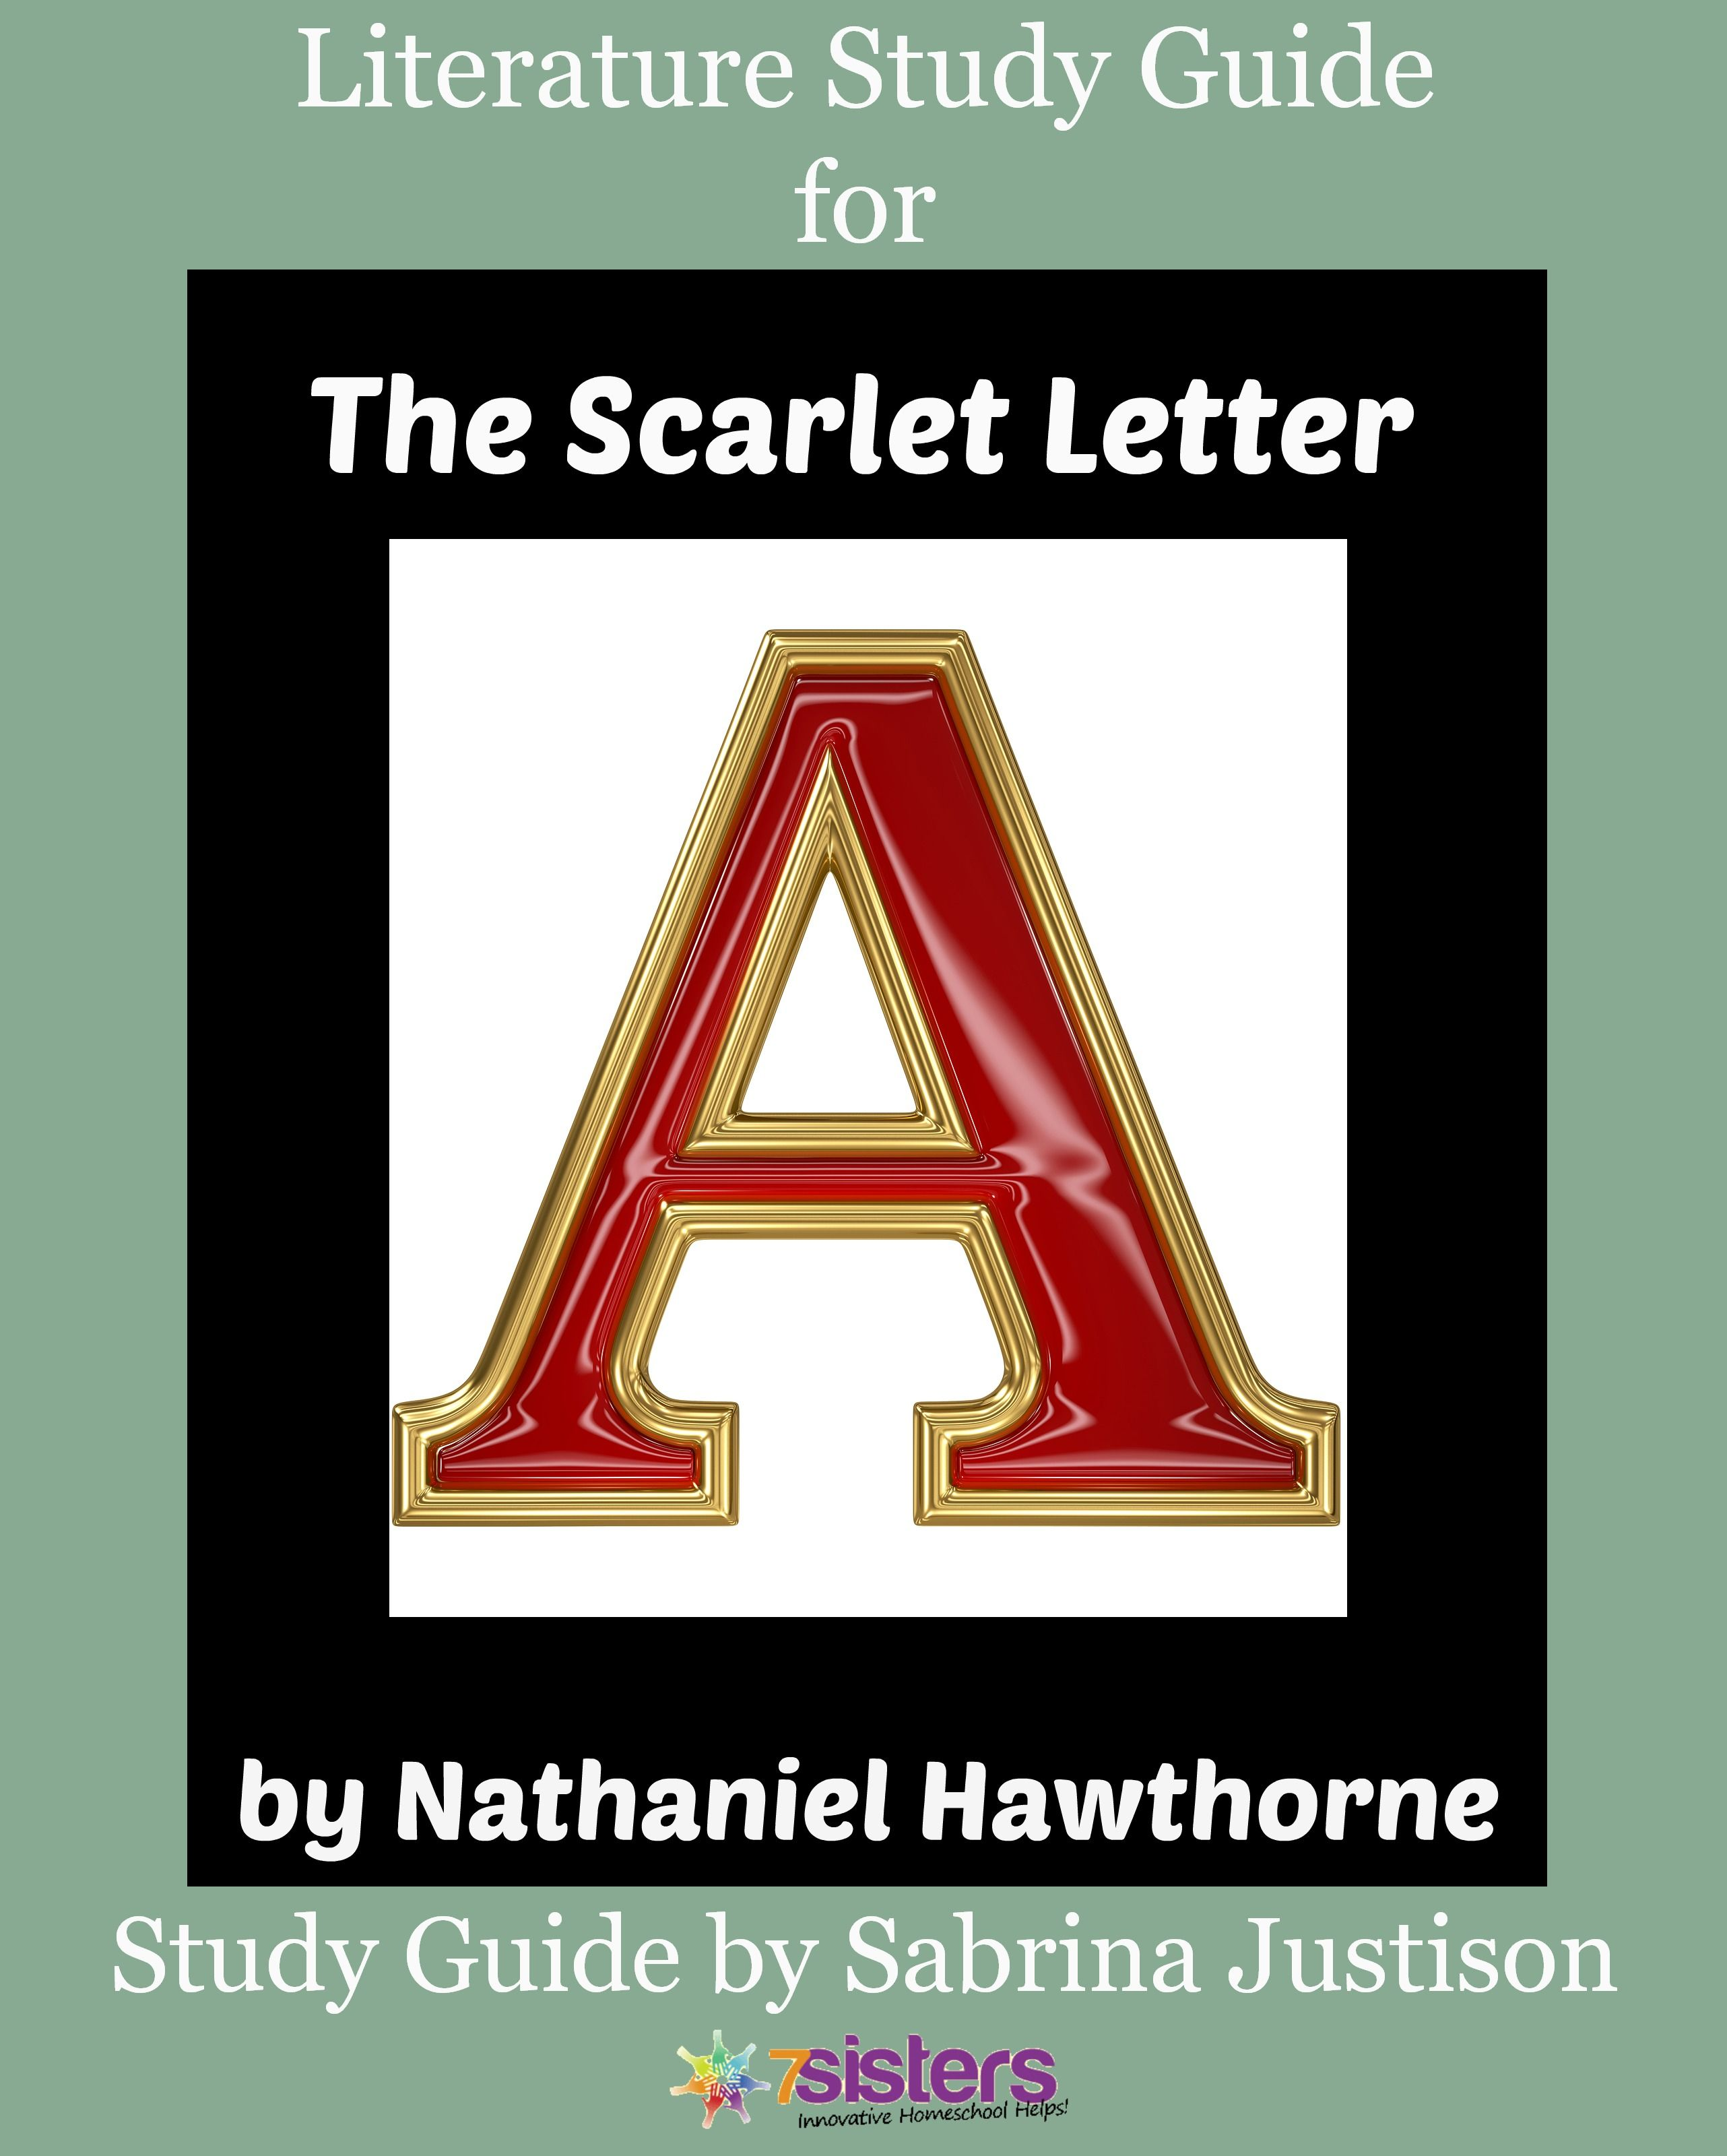 Pin on Literature for Homeschool High School